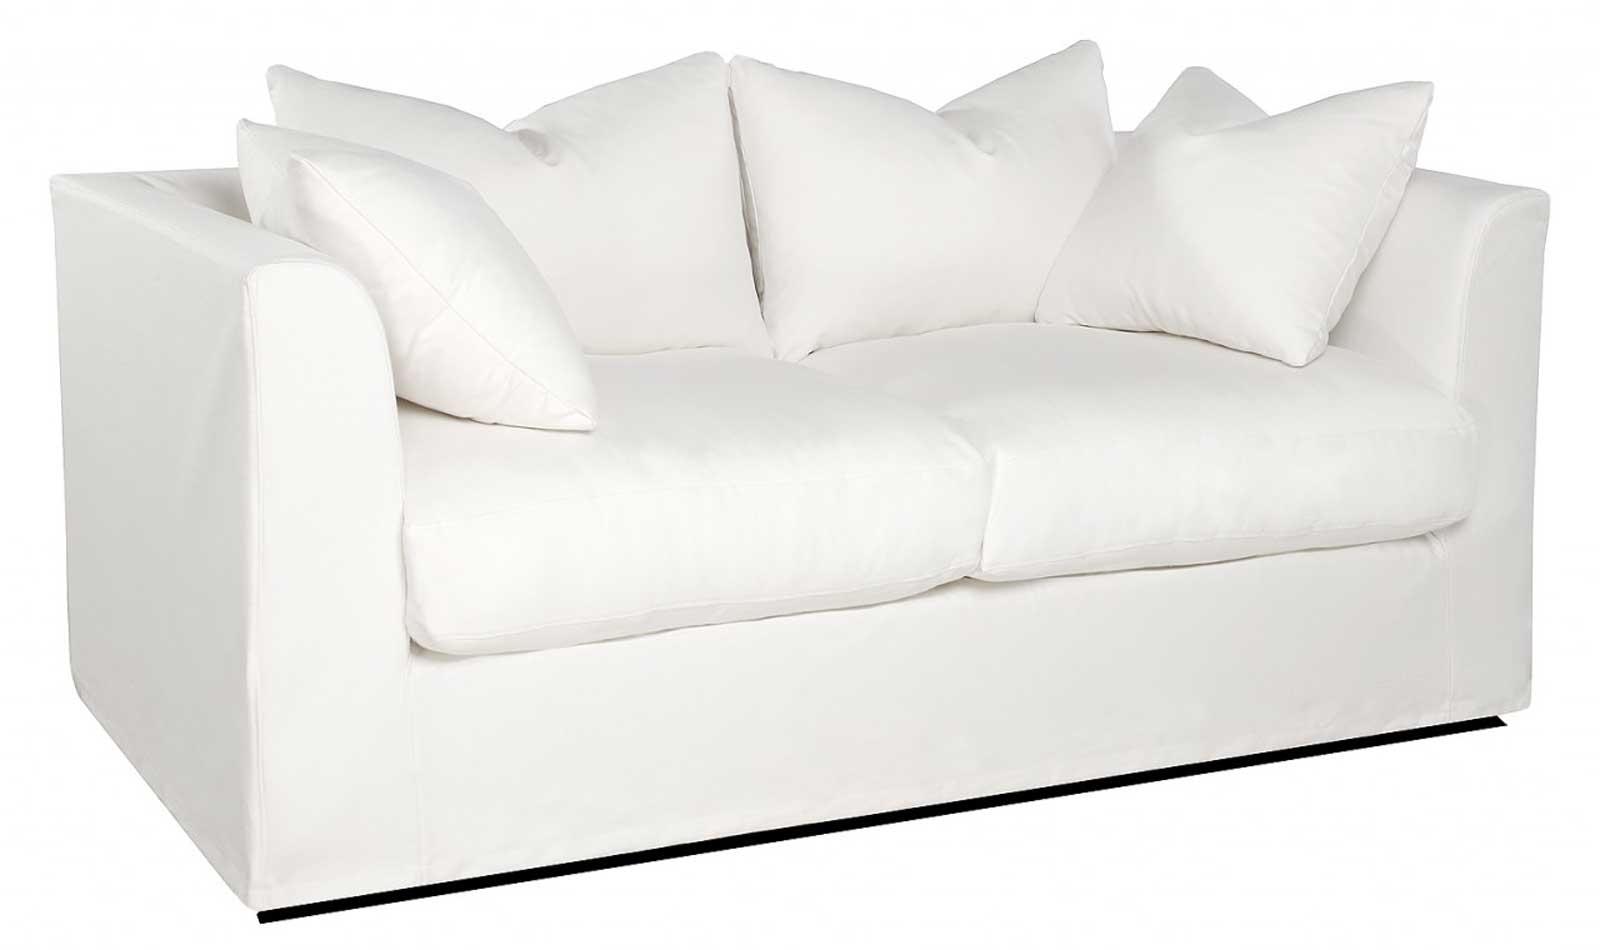 Sectional Sofas Under 1500 For Well Known Furniture : Sleeper Sofa Gel Mattress Best Sleeper Sofa Under  (View 11 of 20)